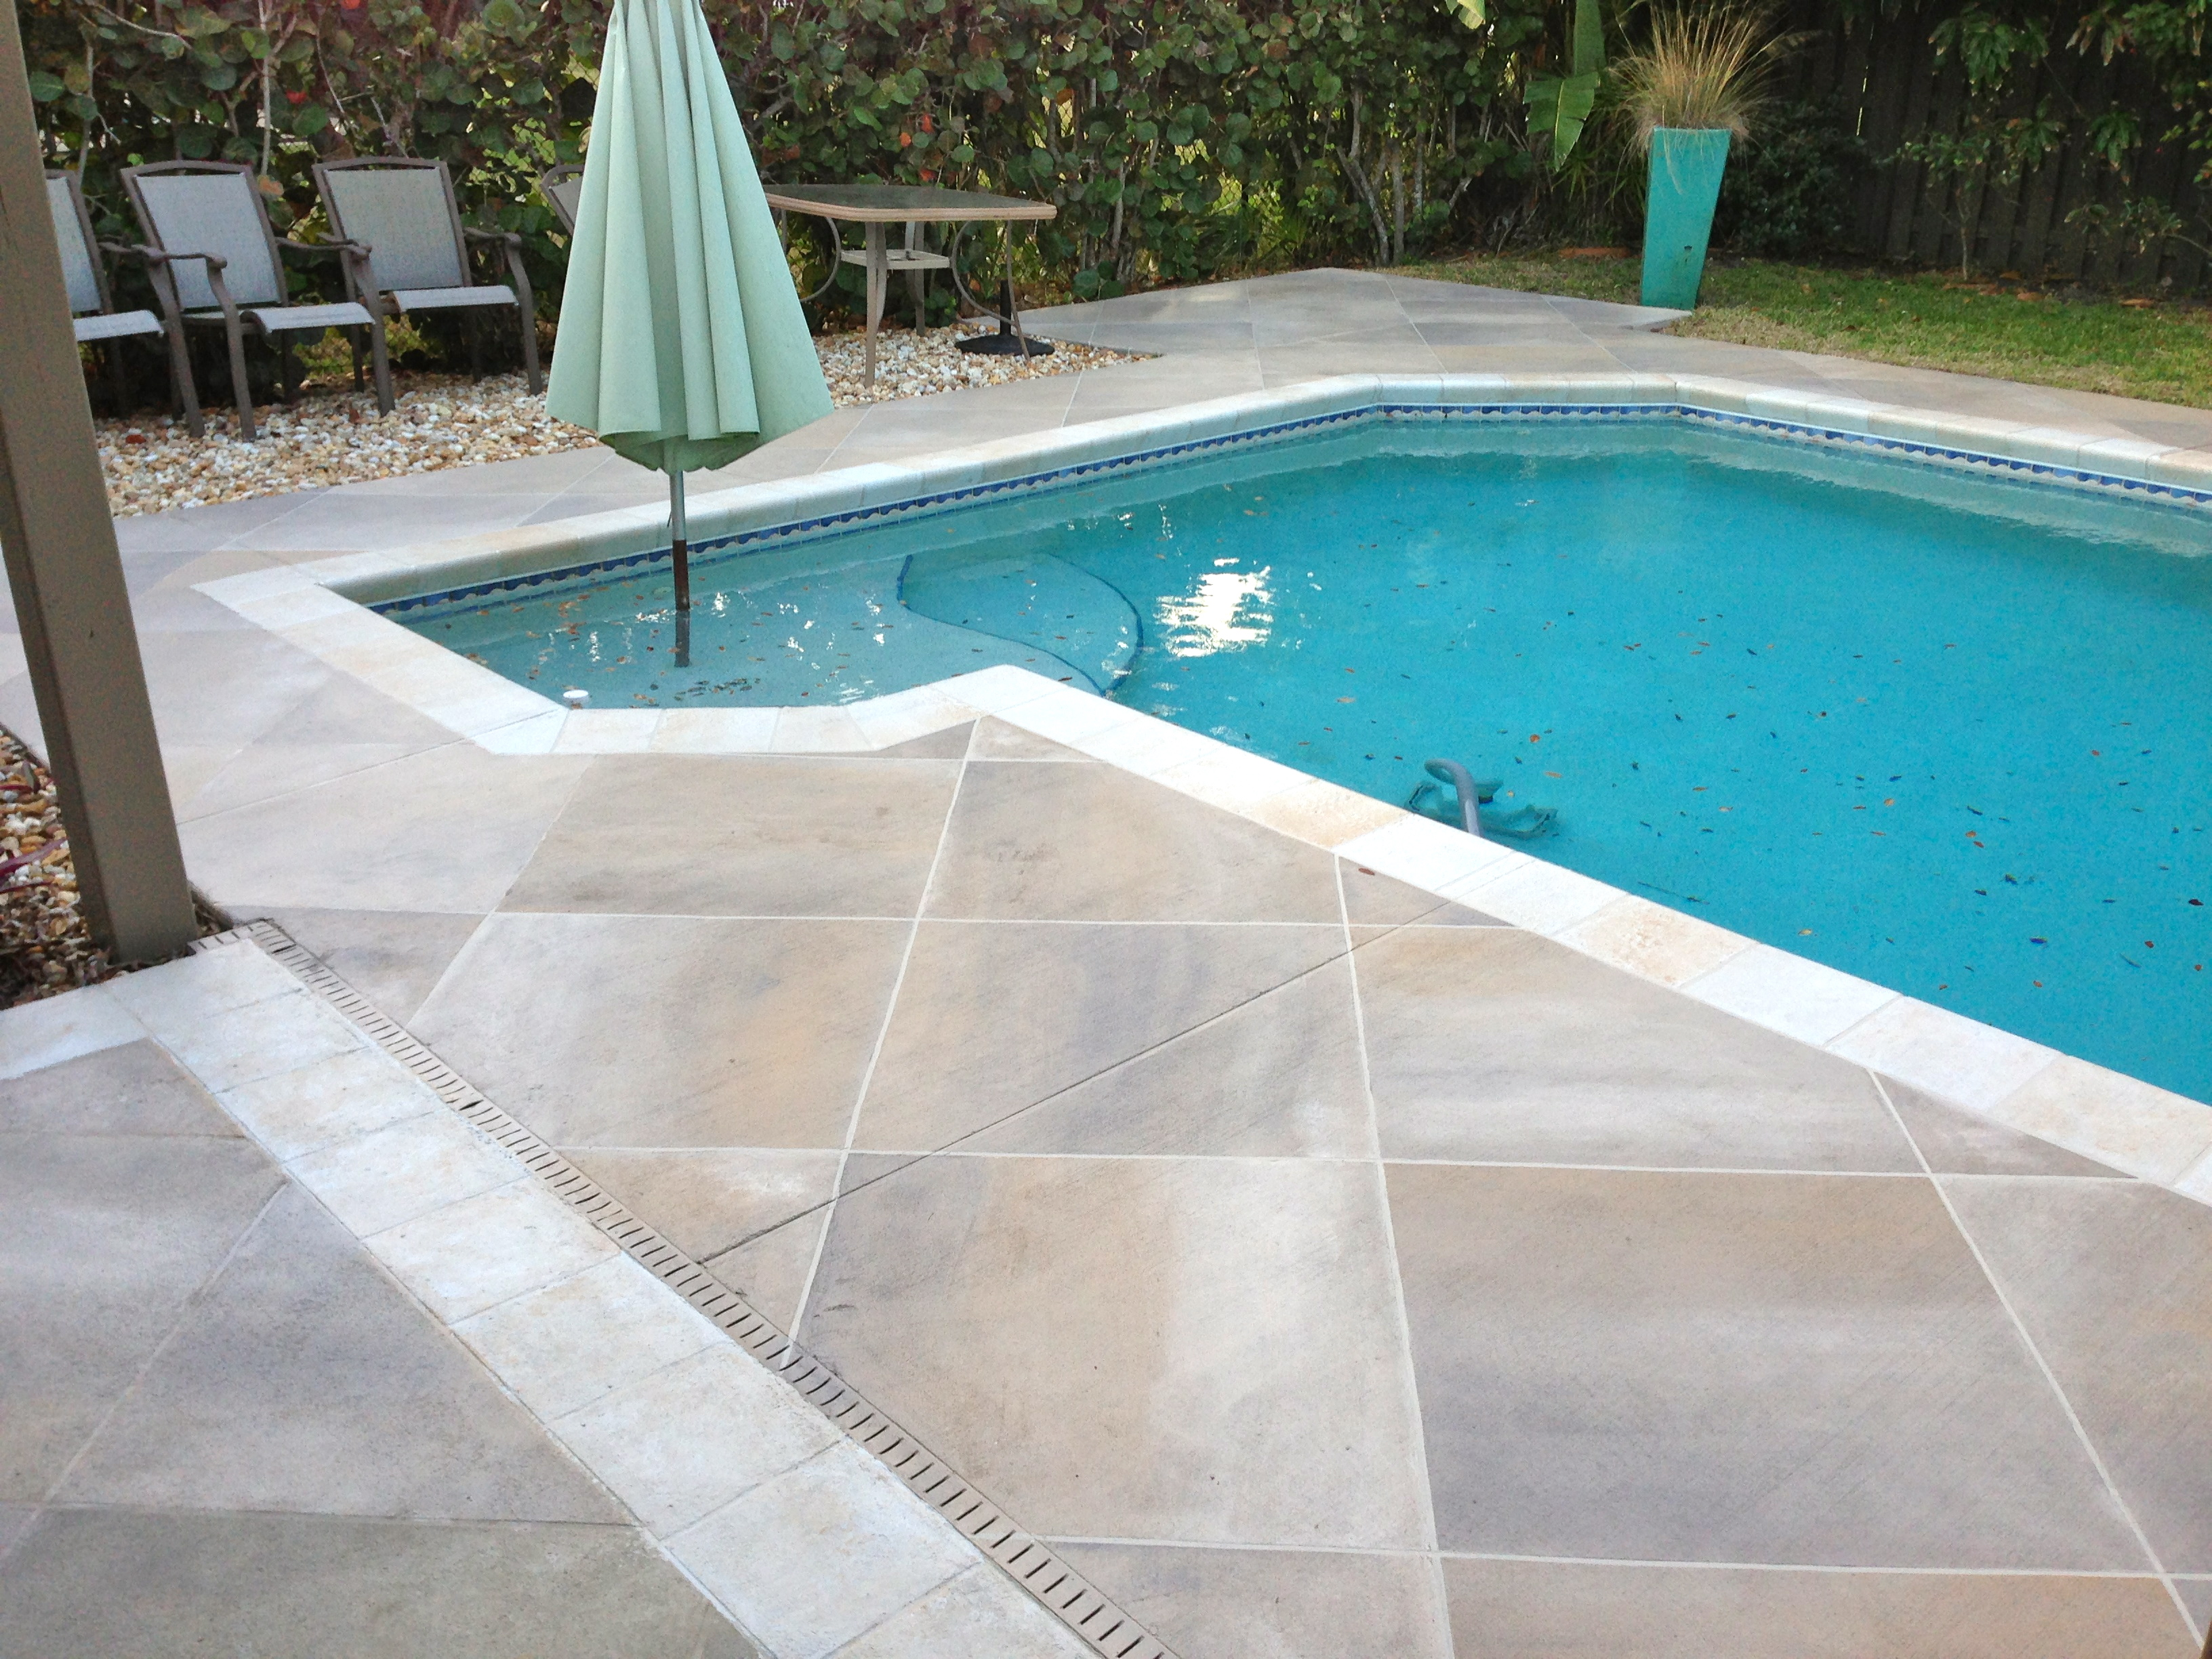 Concrete Designs Florida   Tile pool deck on Pool Patio Design id=39668